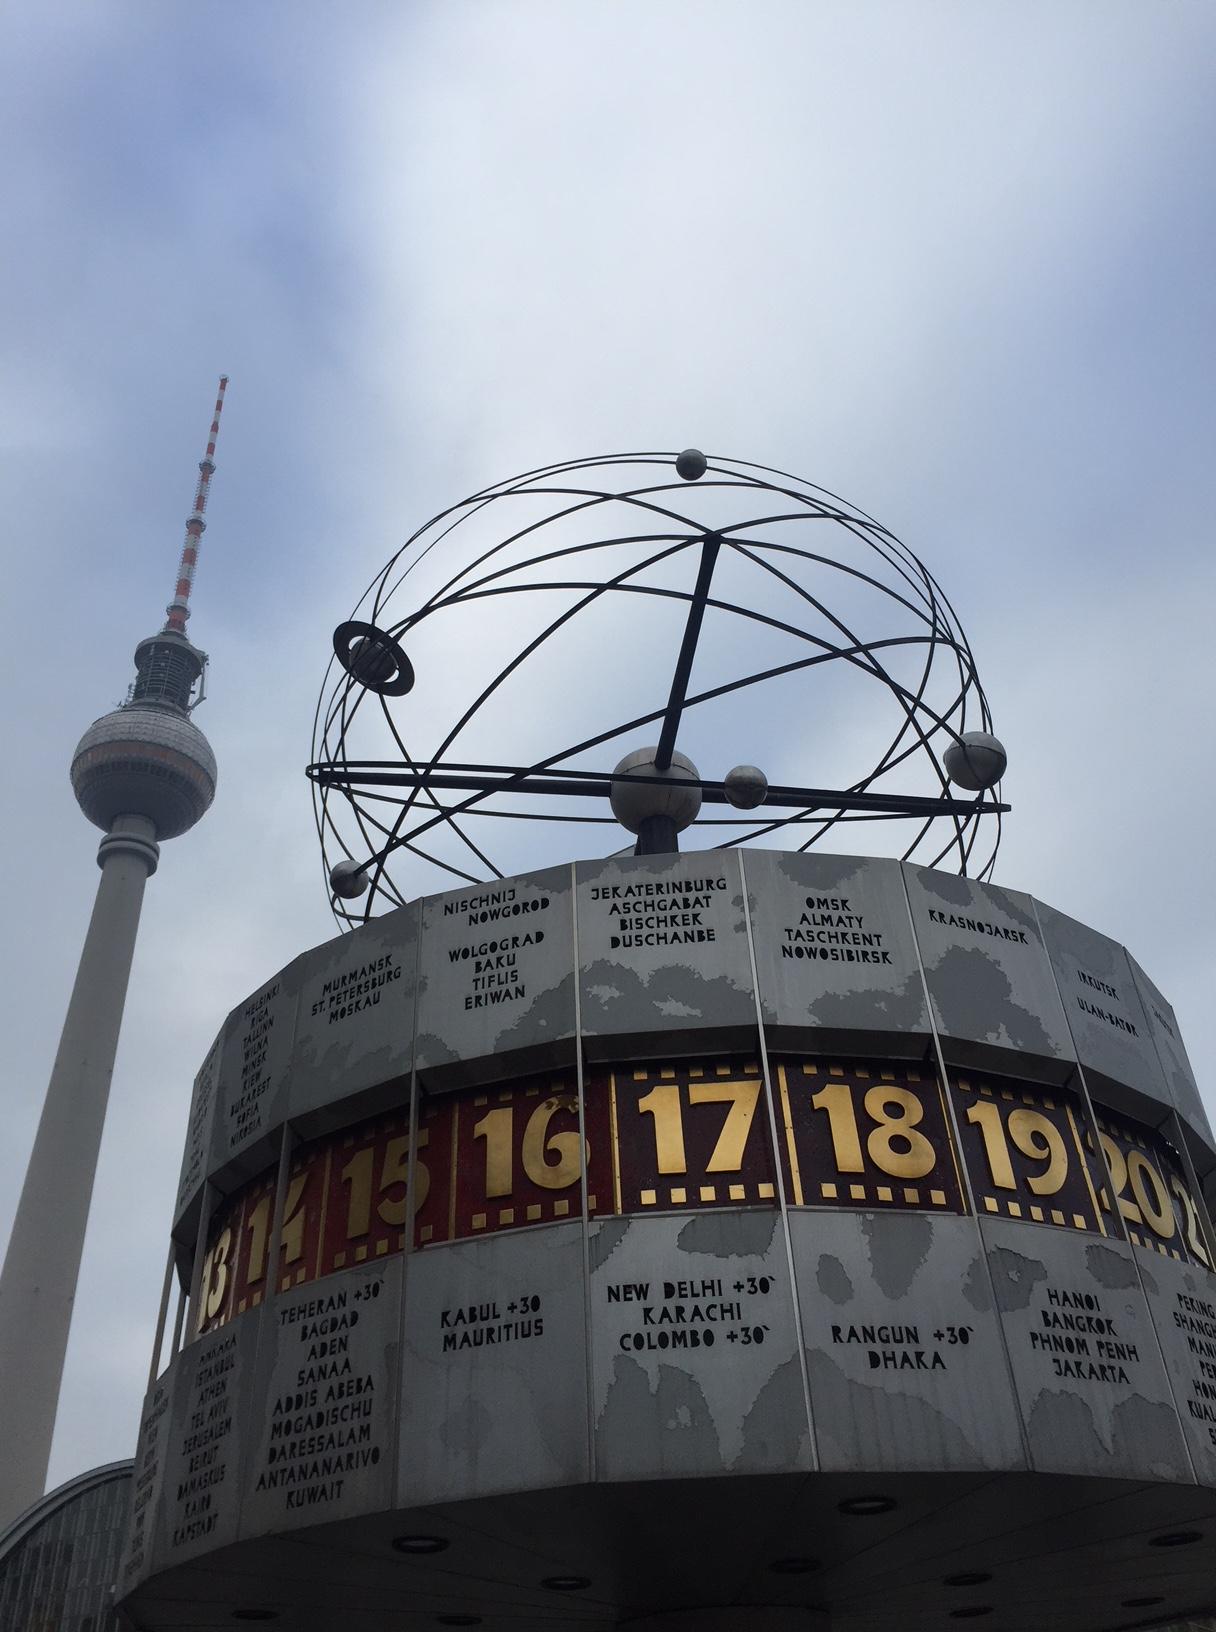 Reloj mundial, Alexanderplatz